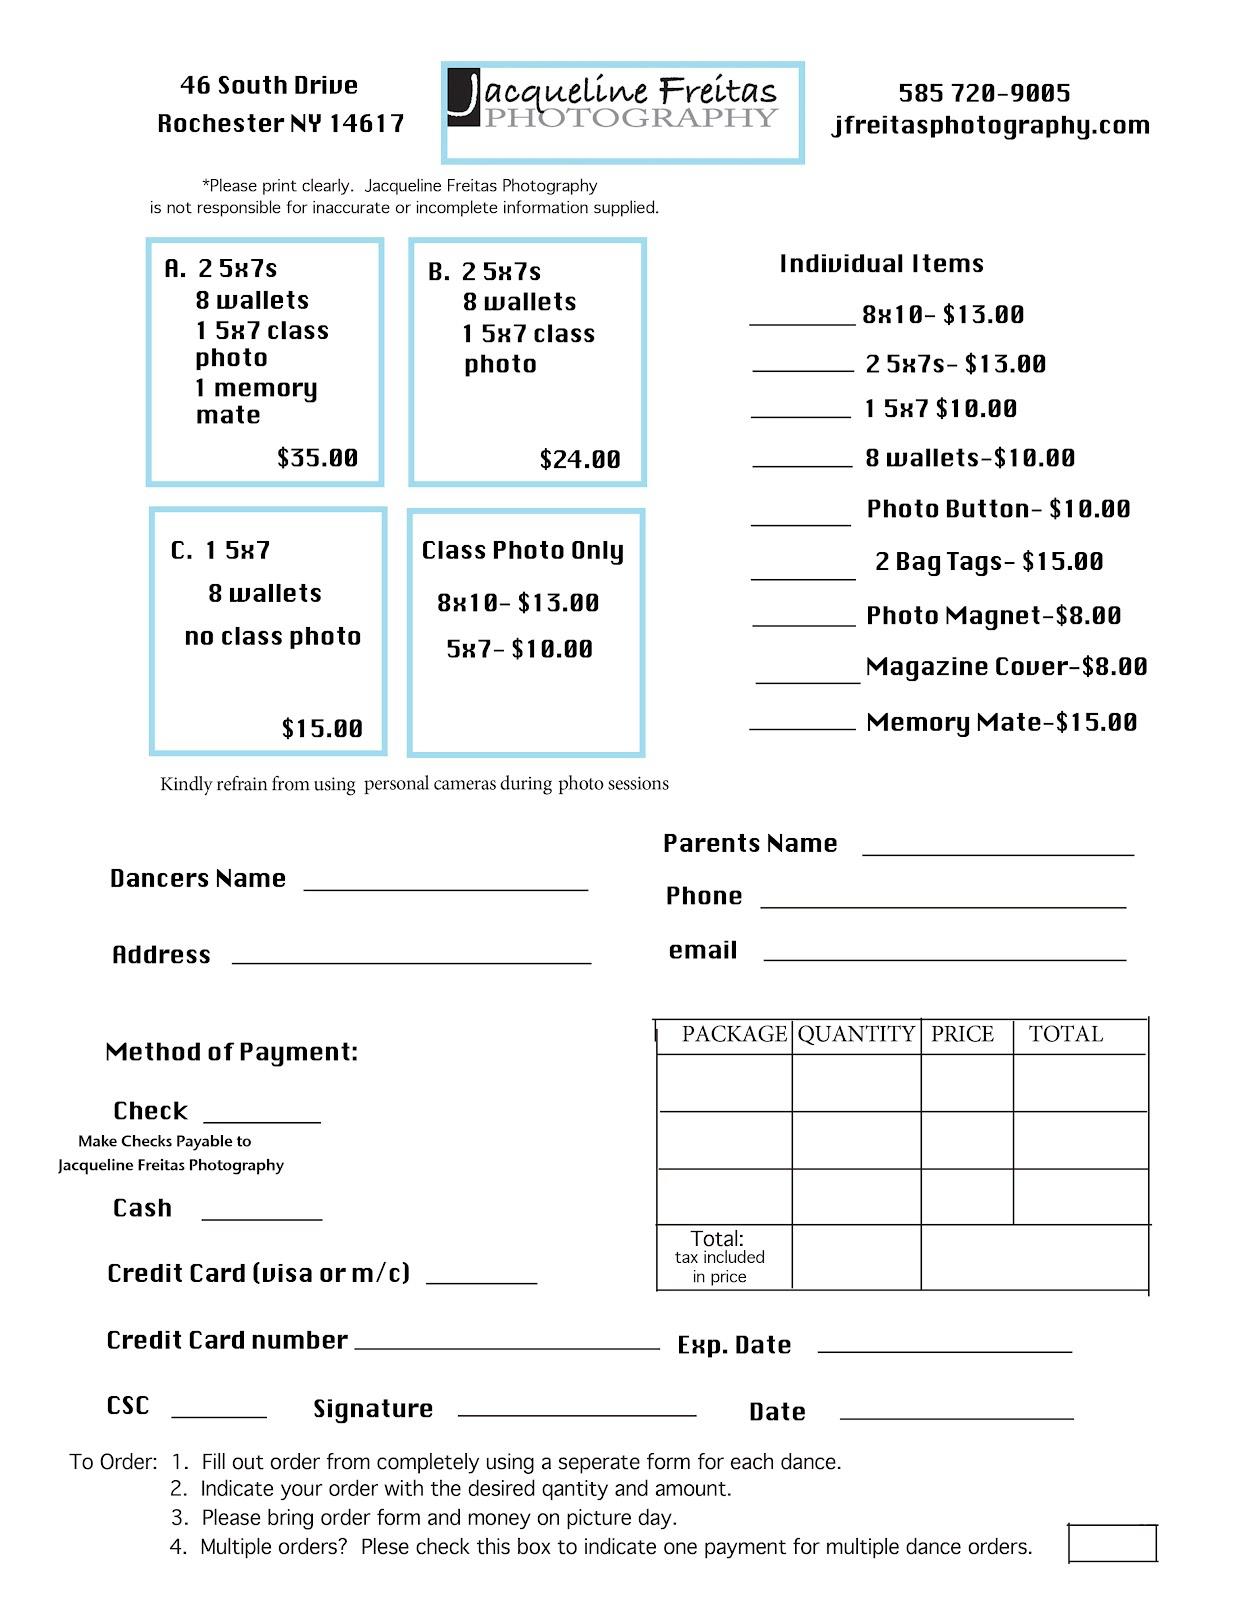 Jacqueline Freitas Photography Dance Order Forms – Photography Order Form